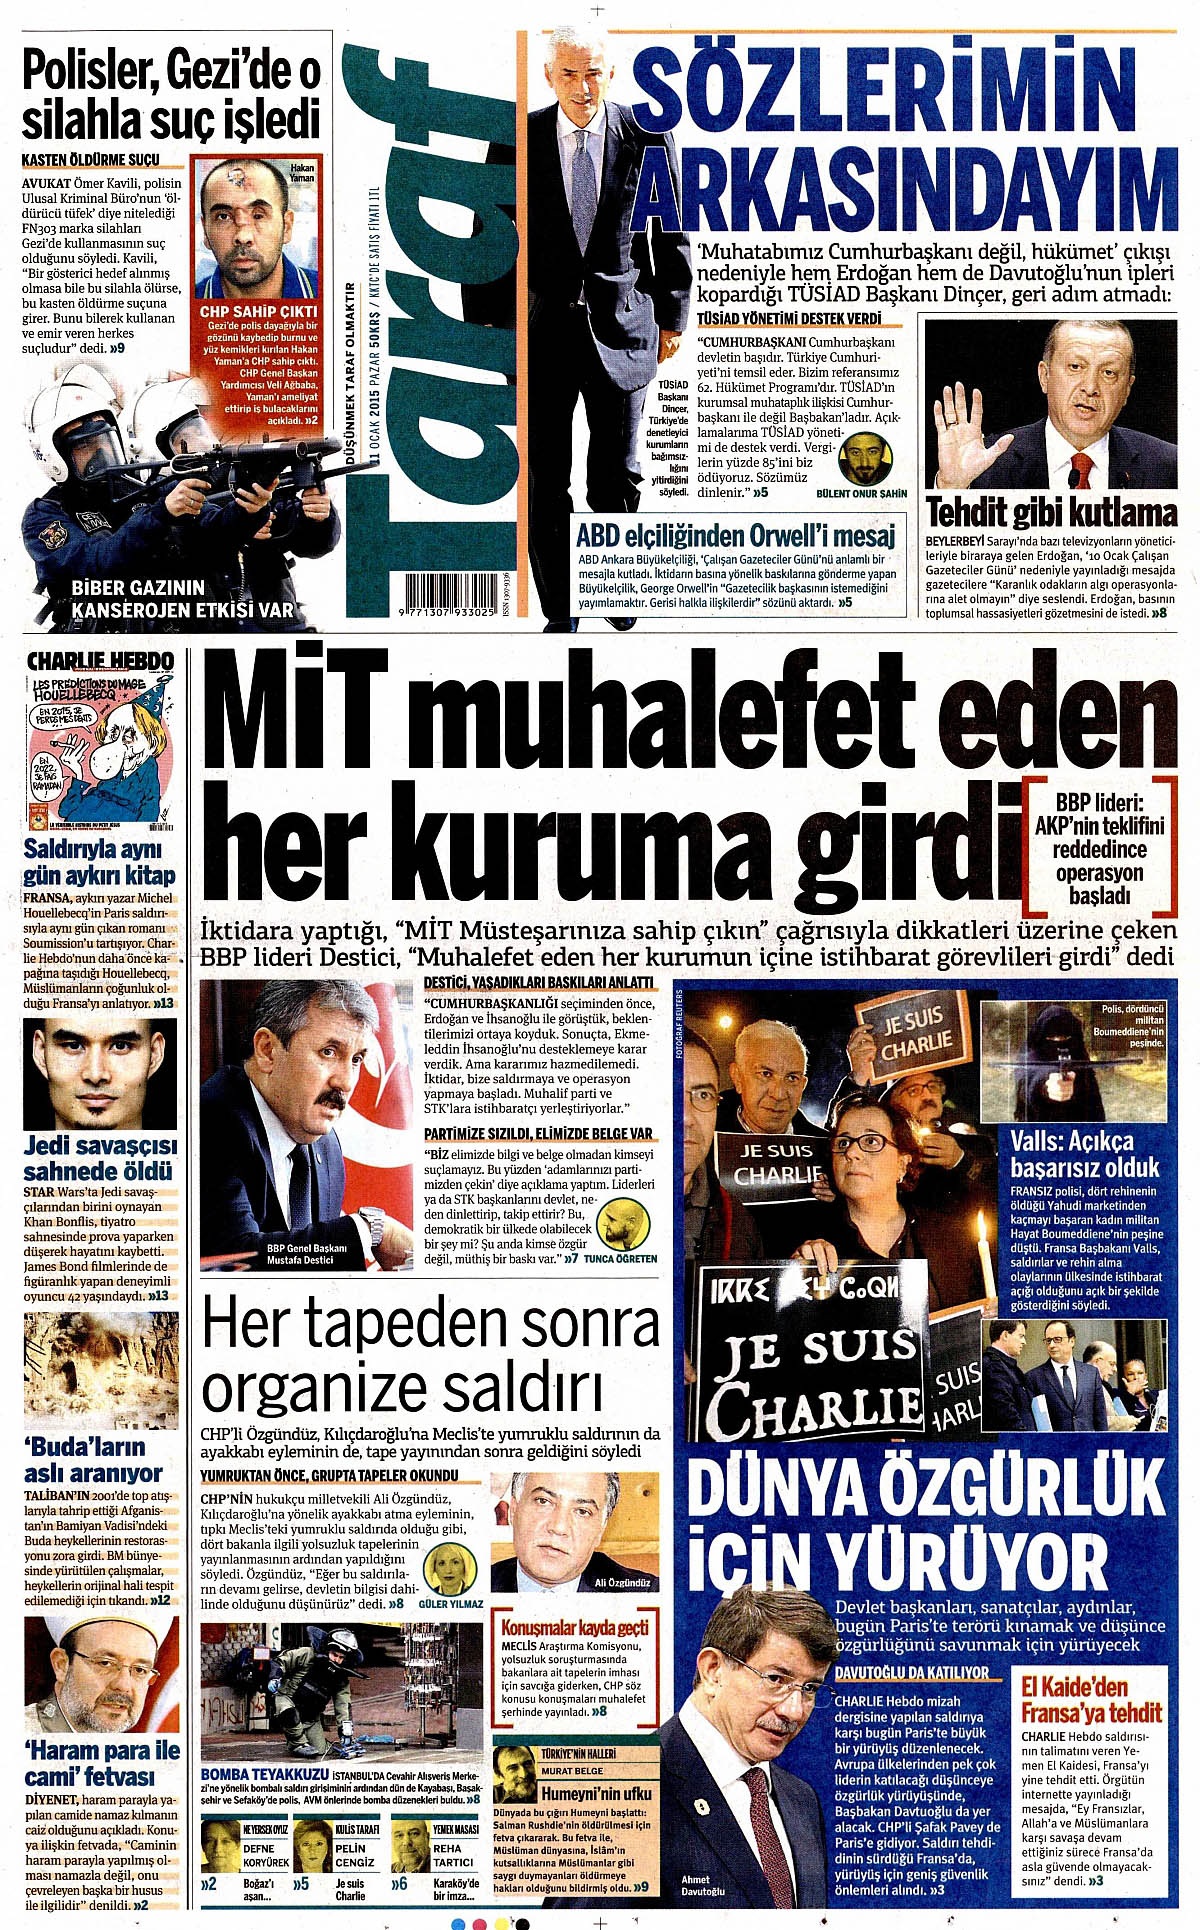 taraf-gazetesi_82306